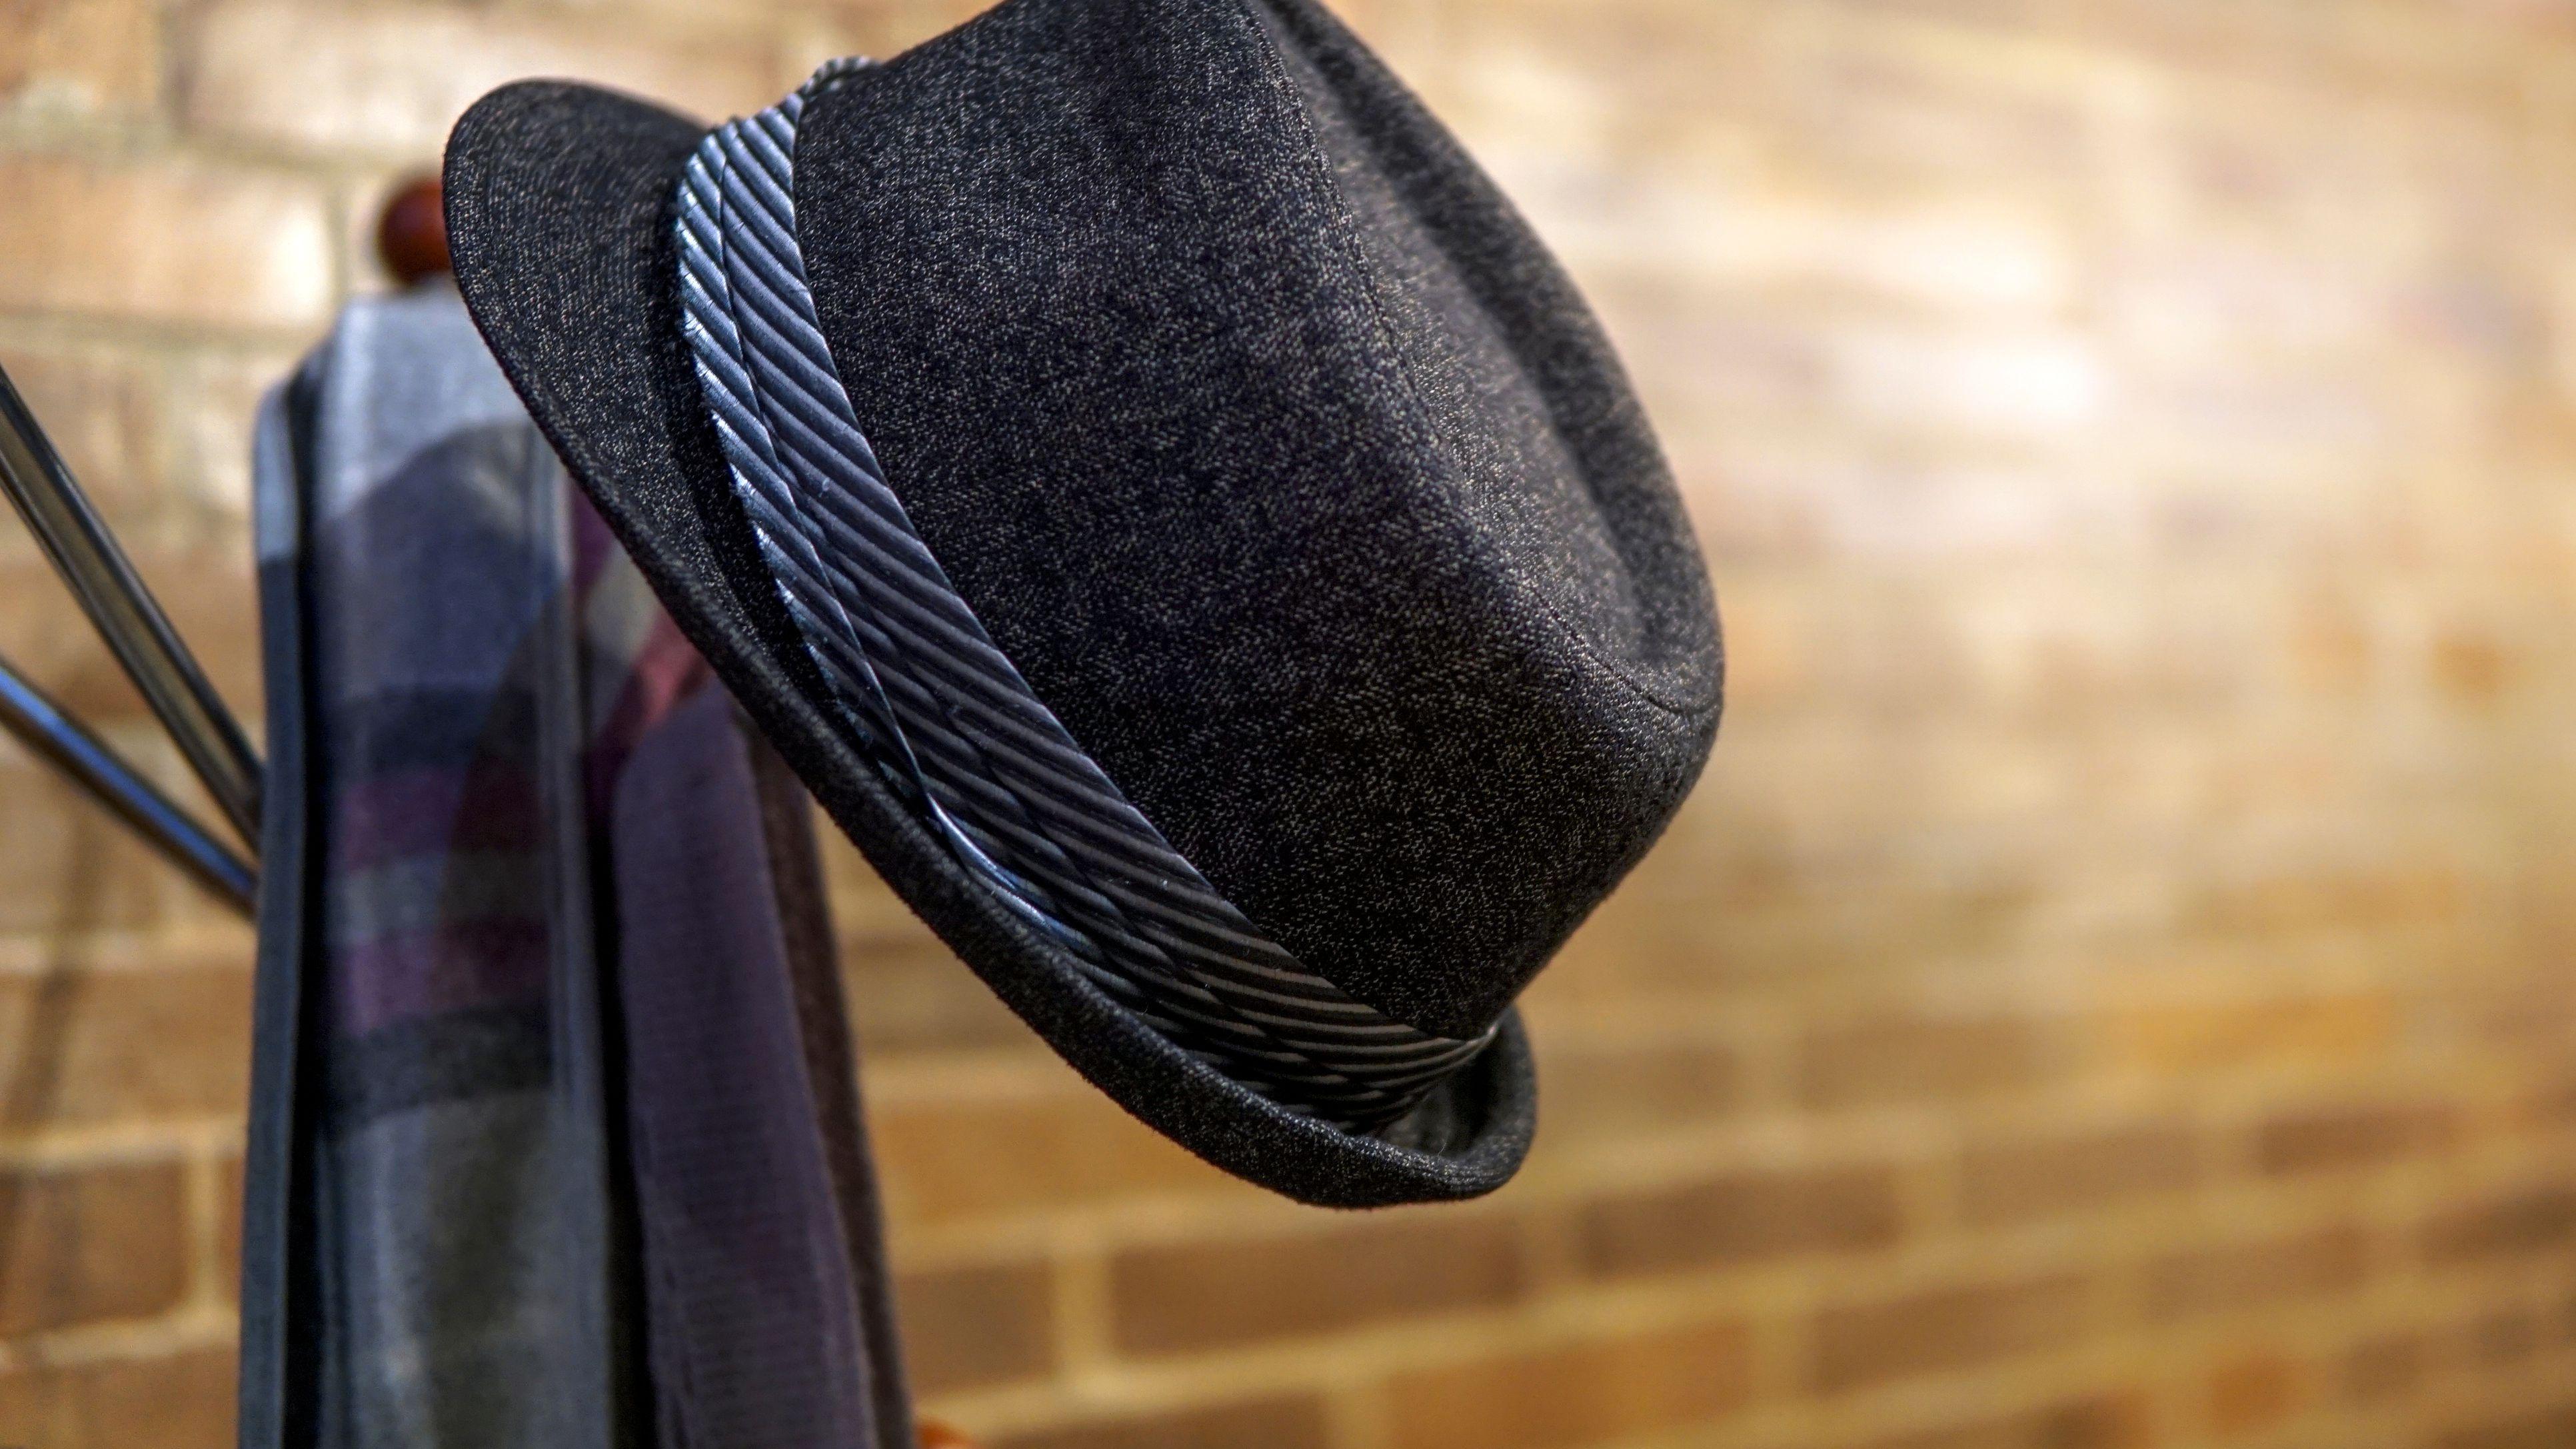 Great Garen Shed Wall Decor! Woven Hat Vintage Floppy Garden Hat with Blue Grosgrain Ribbon